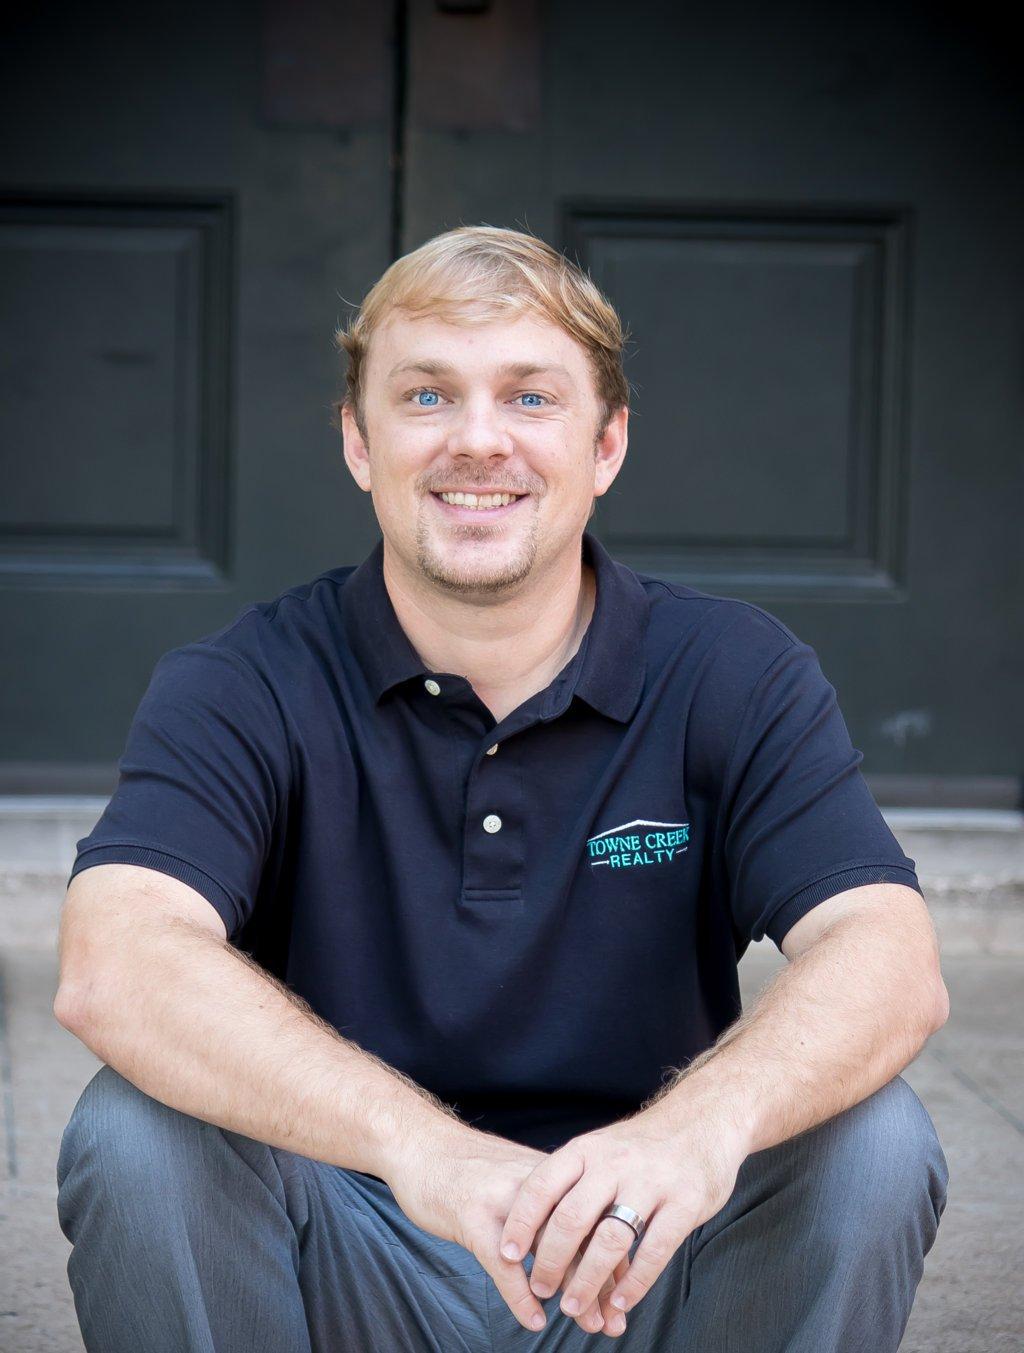 Chris Thompson of Towne Creek Realty